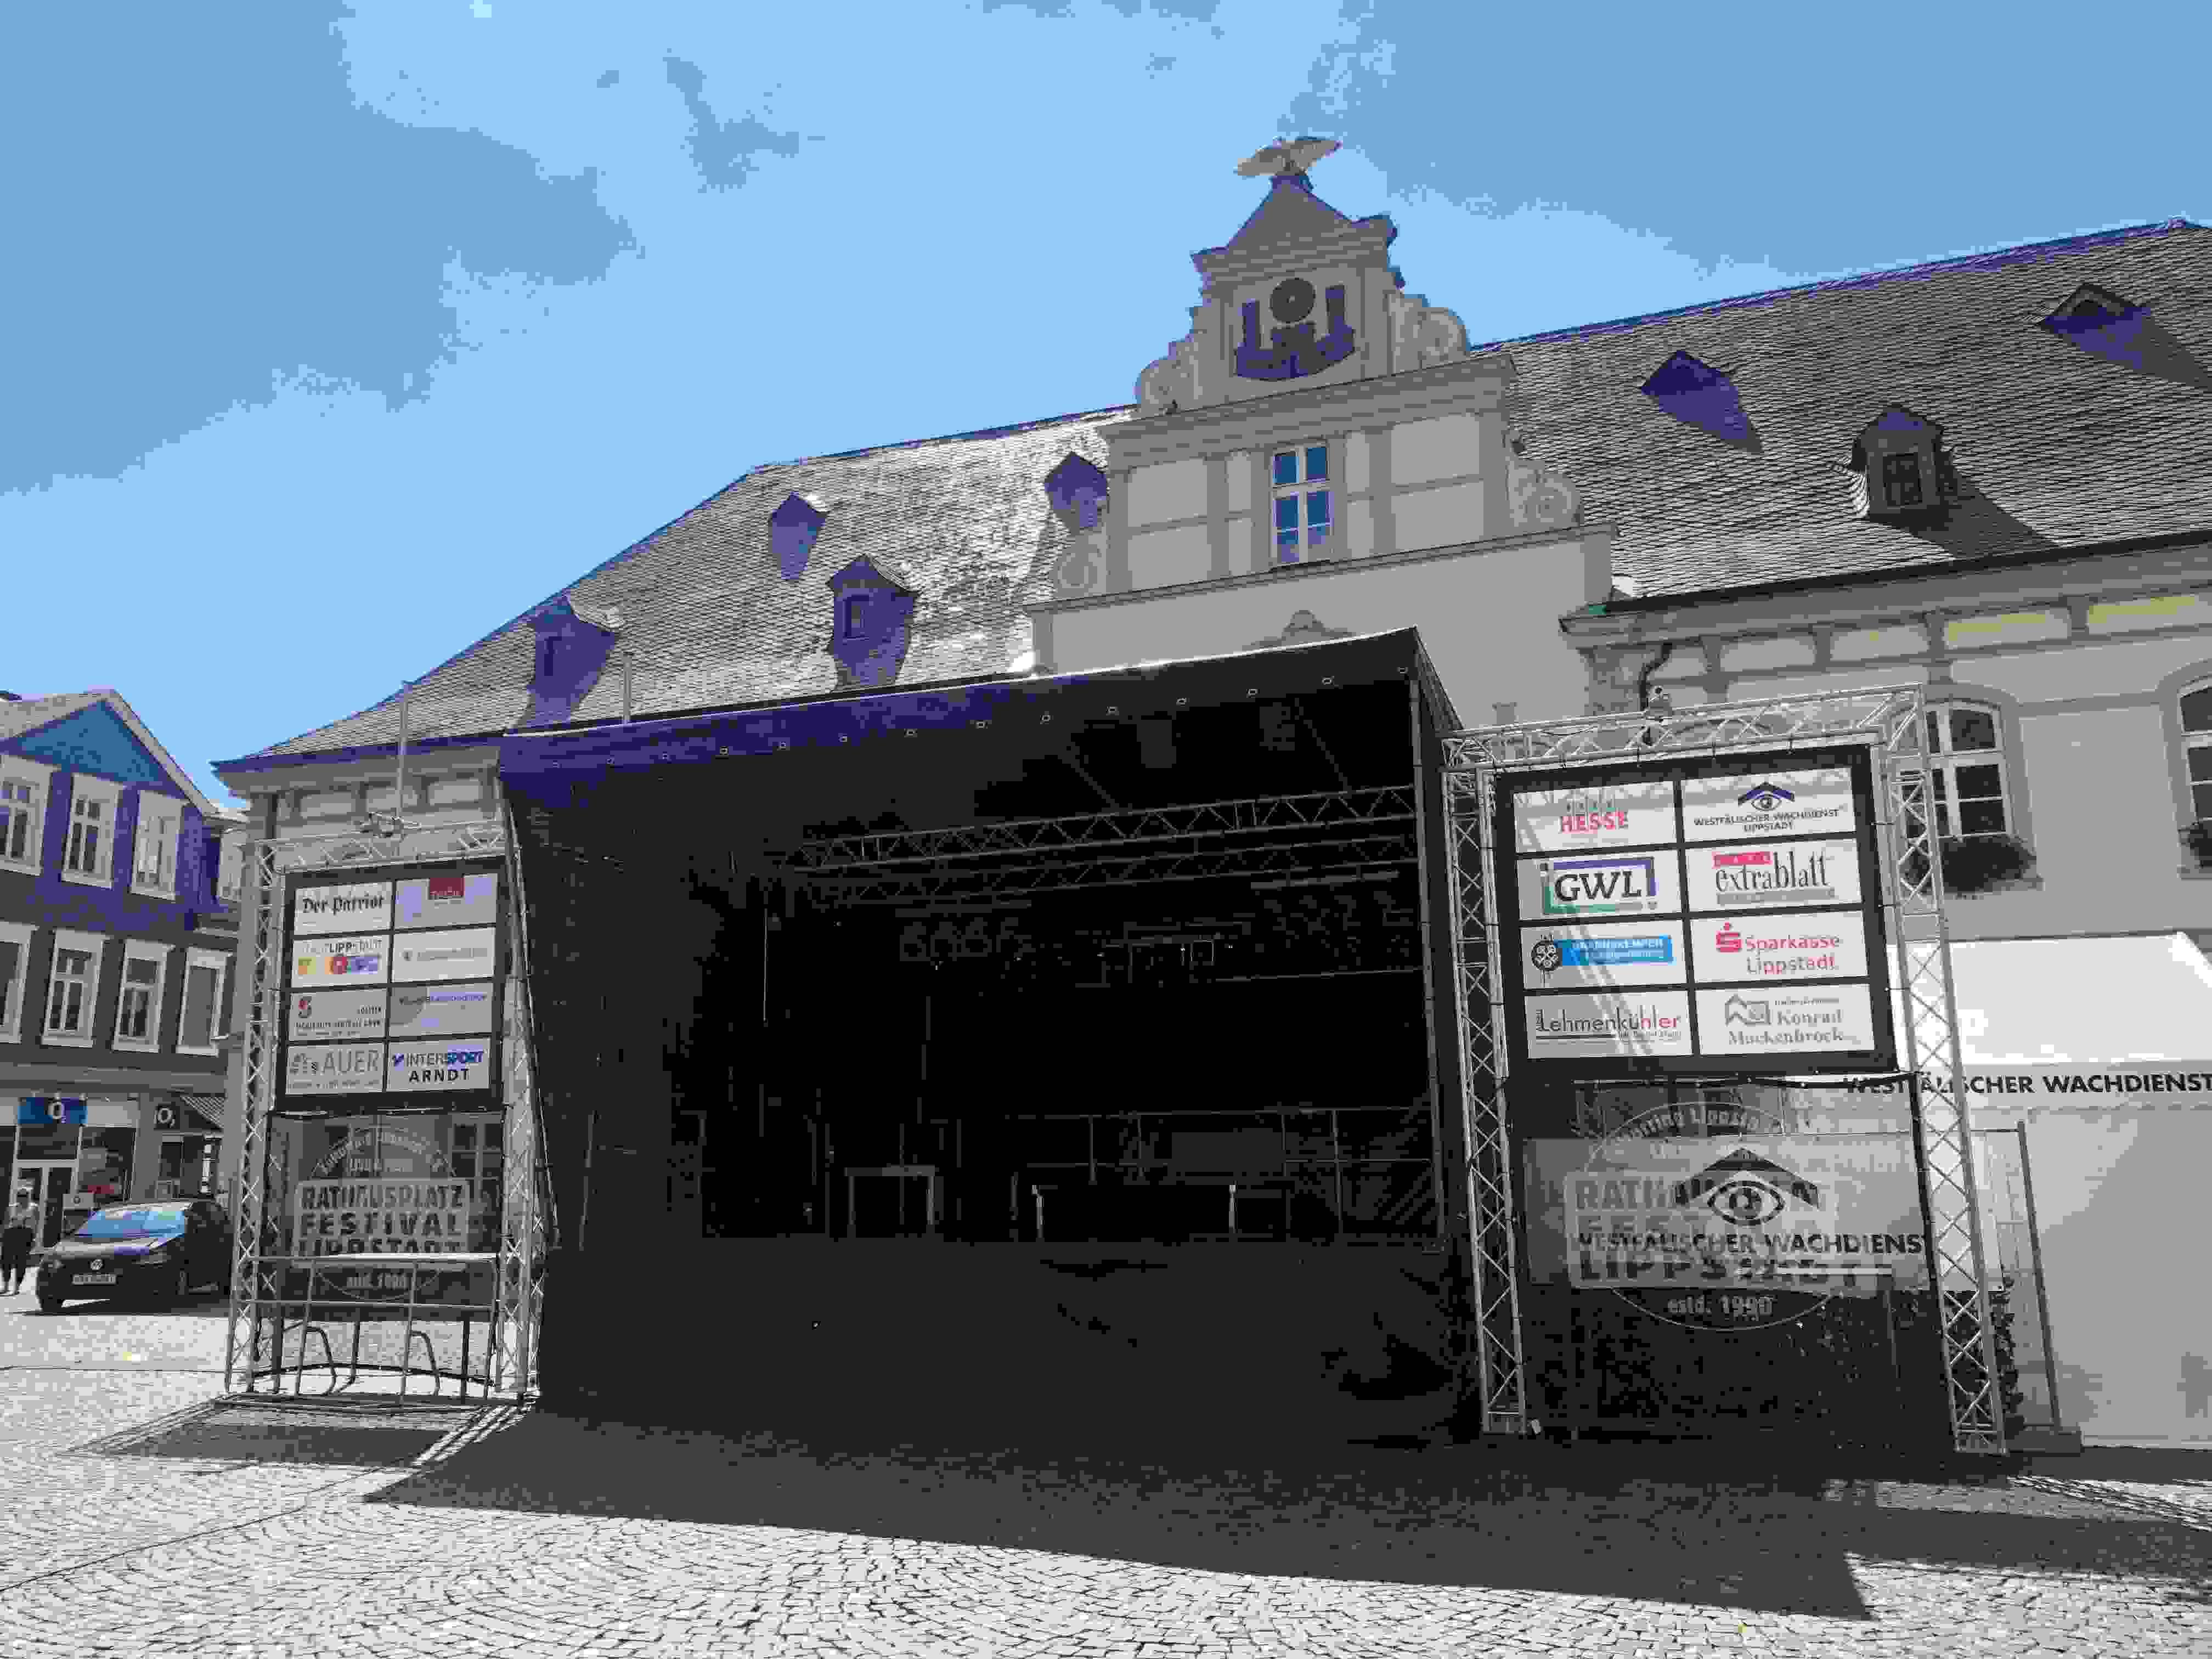 Heute beim 29. Rathausplatz-Festival